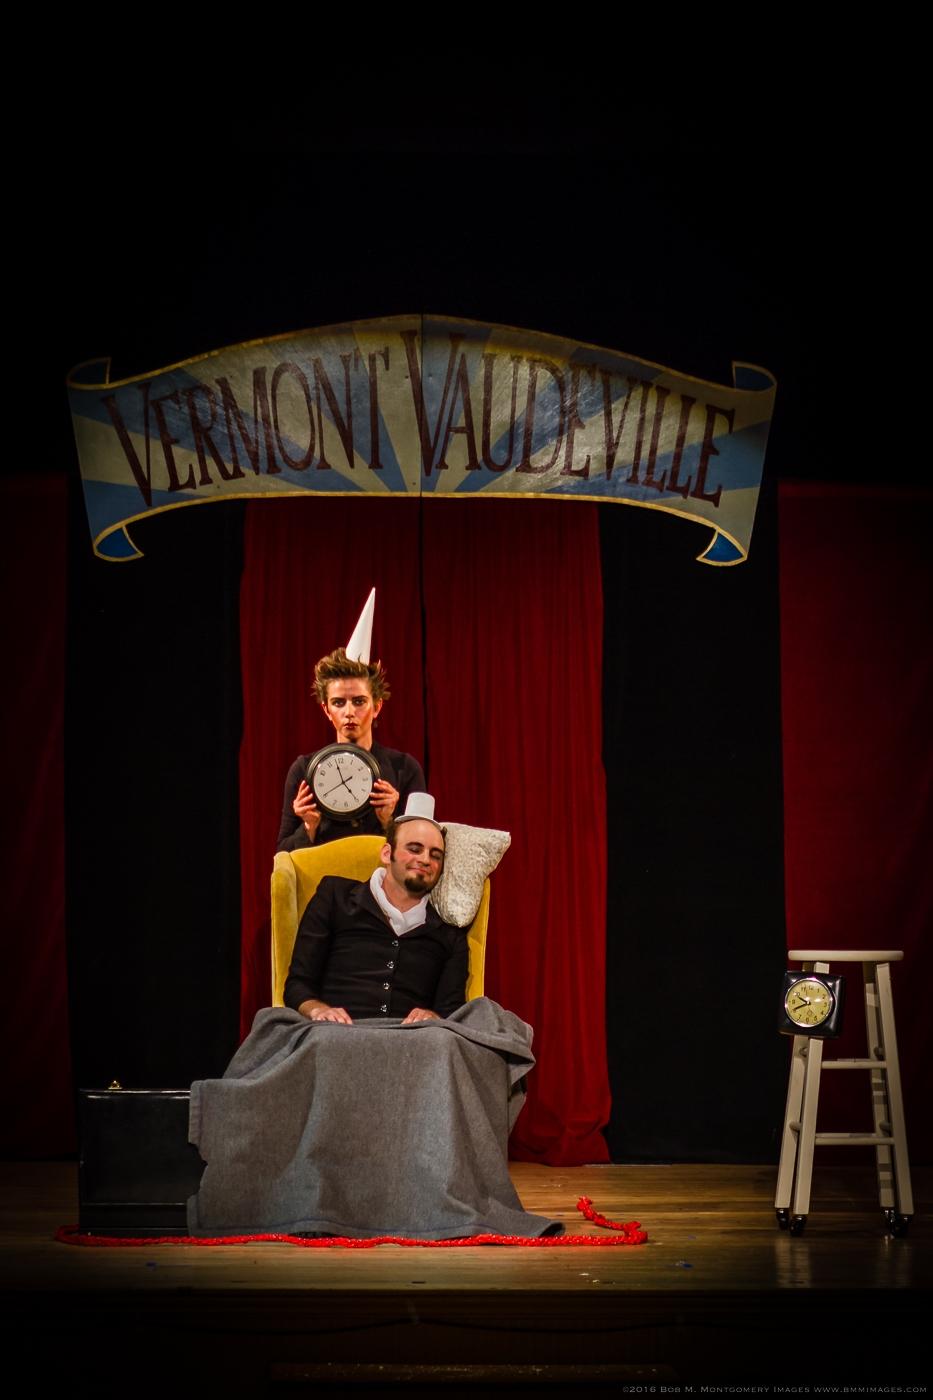 Vermont Vaudeville 20160513 - 0077.jpg